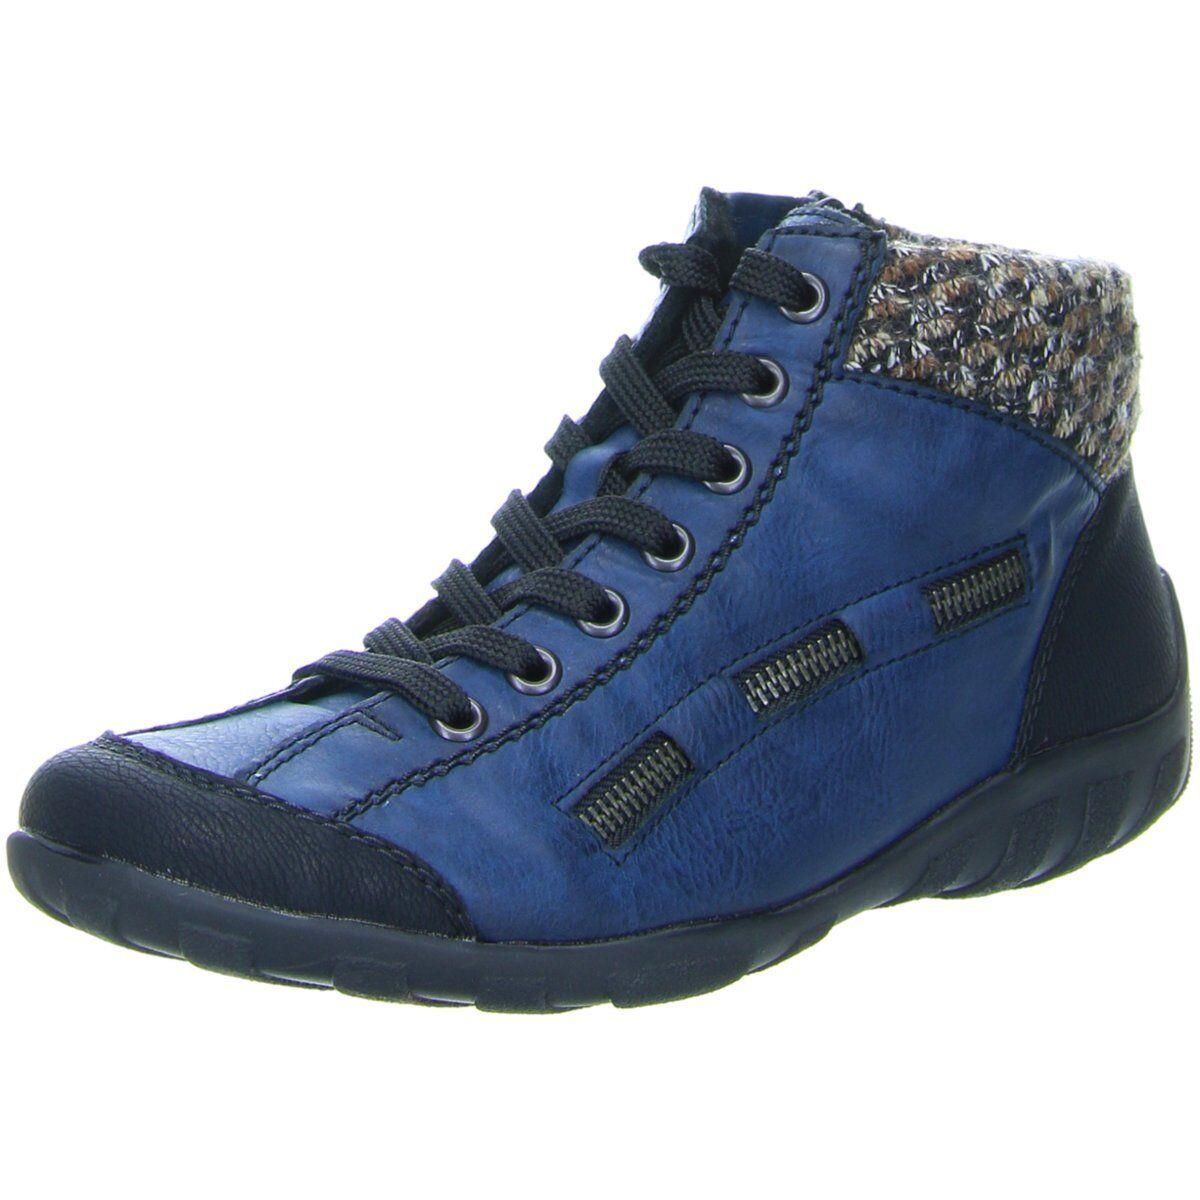 Rieker Damen Damen Damen Stiefeletten L6543-00 00 blau 341804 a0cdbd